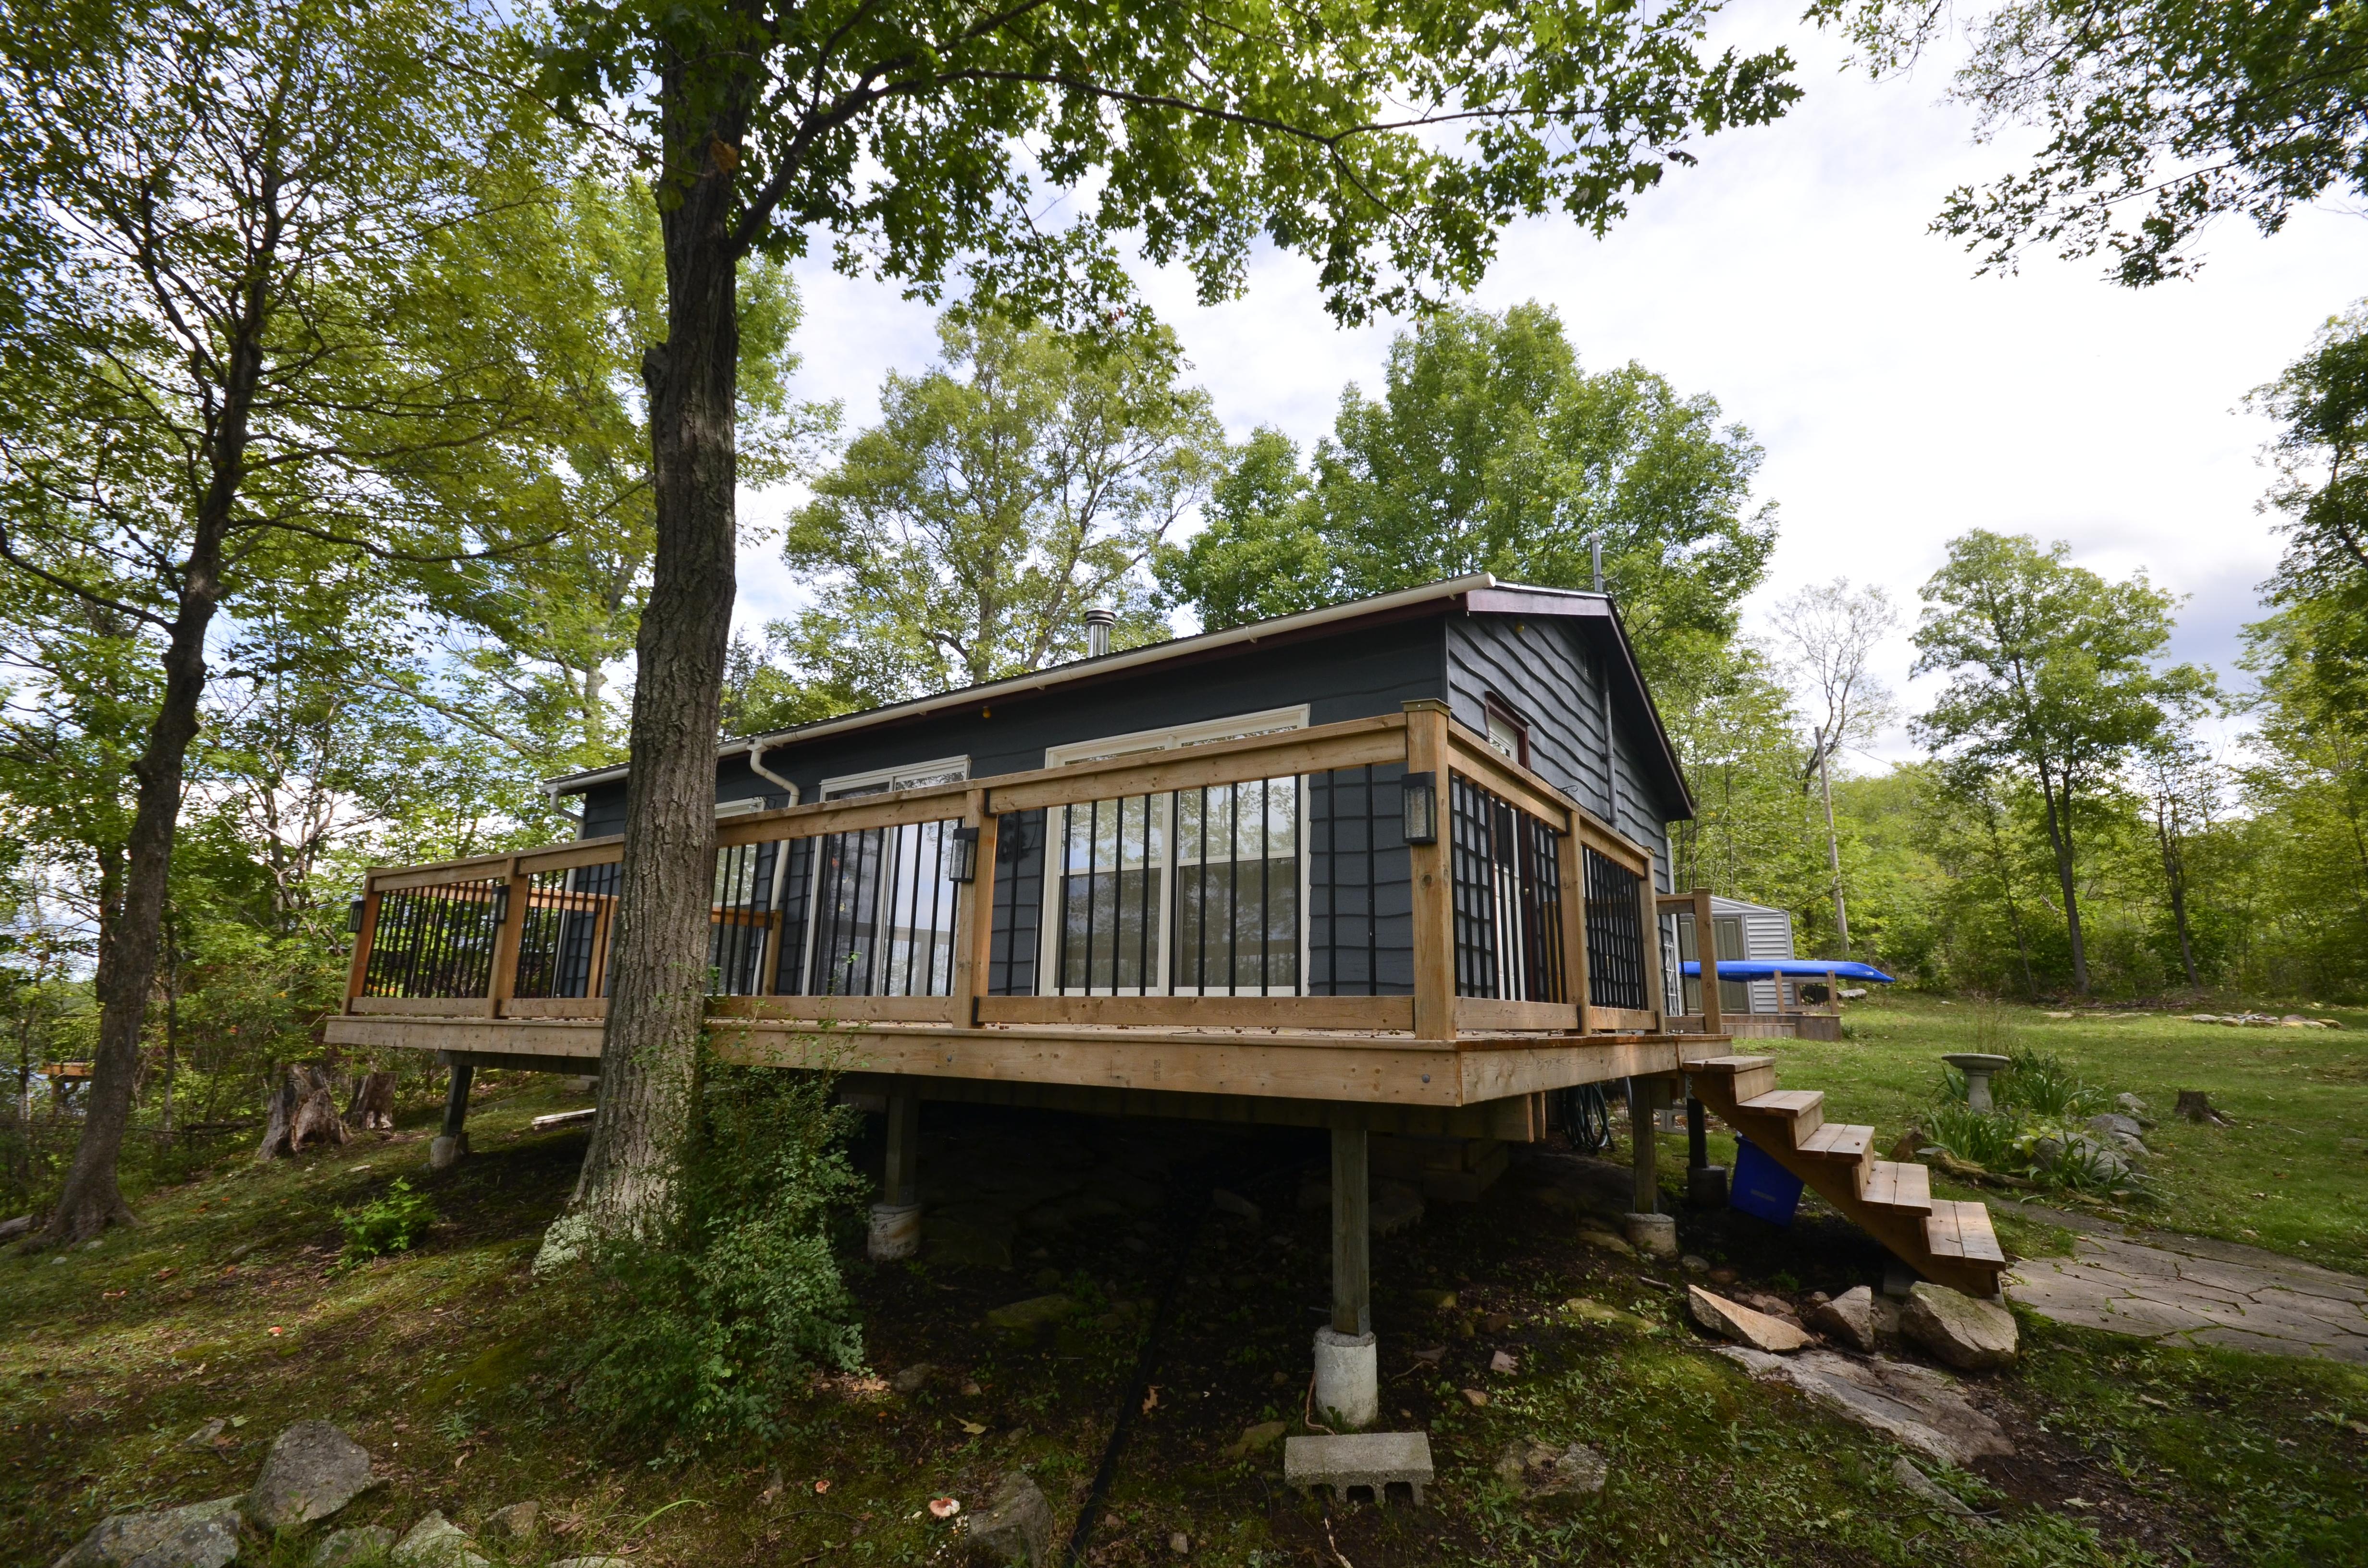 Bobs Lake  $287,500, 135 Badour Island, Parham, Ontario